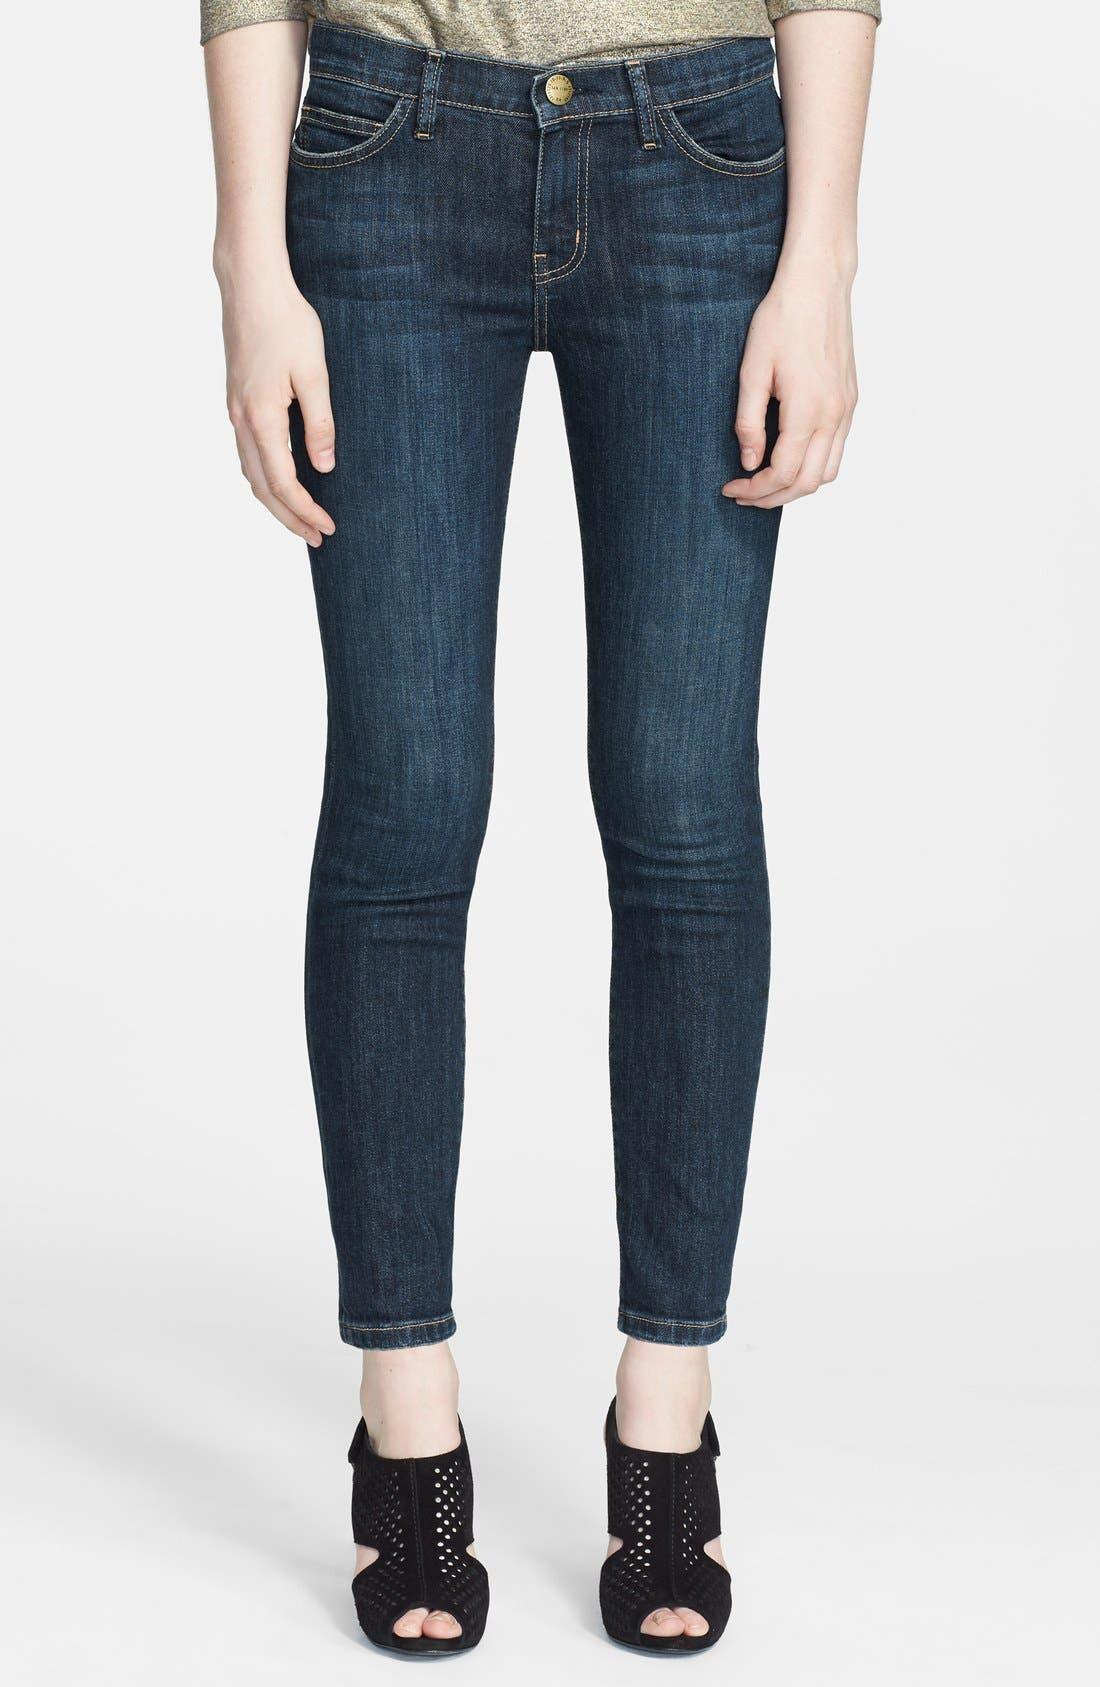 Main Image - Current/Elliott 'The Stiletto' Skinny Jeans (Alumni)